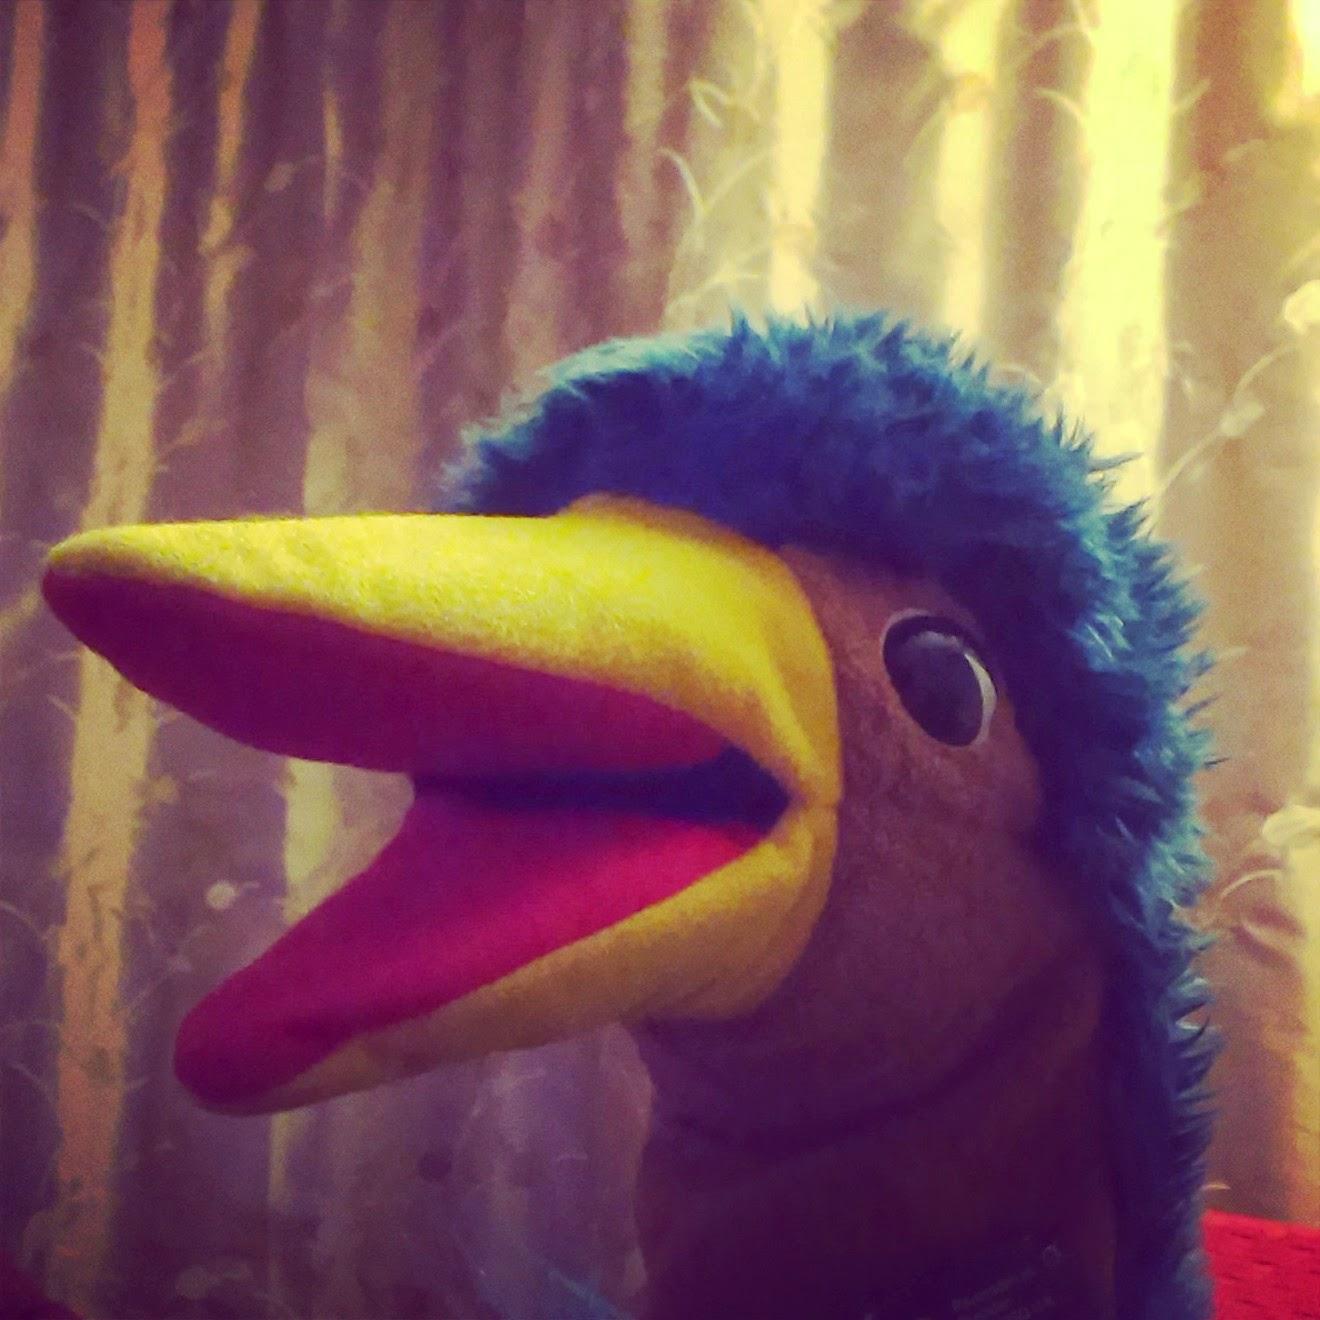 Emu toy